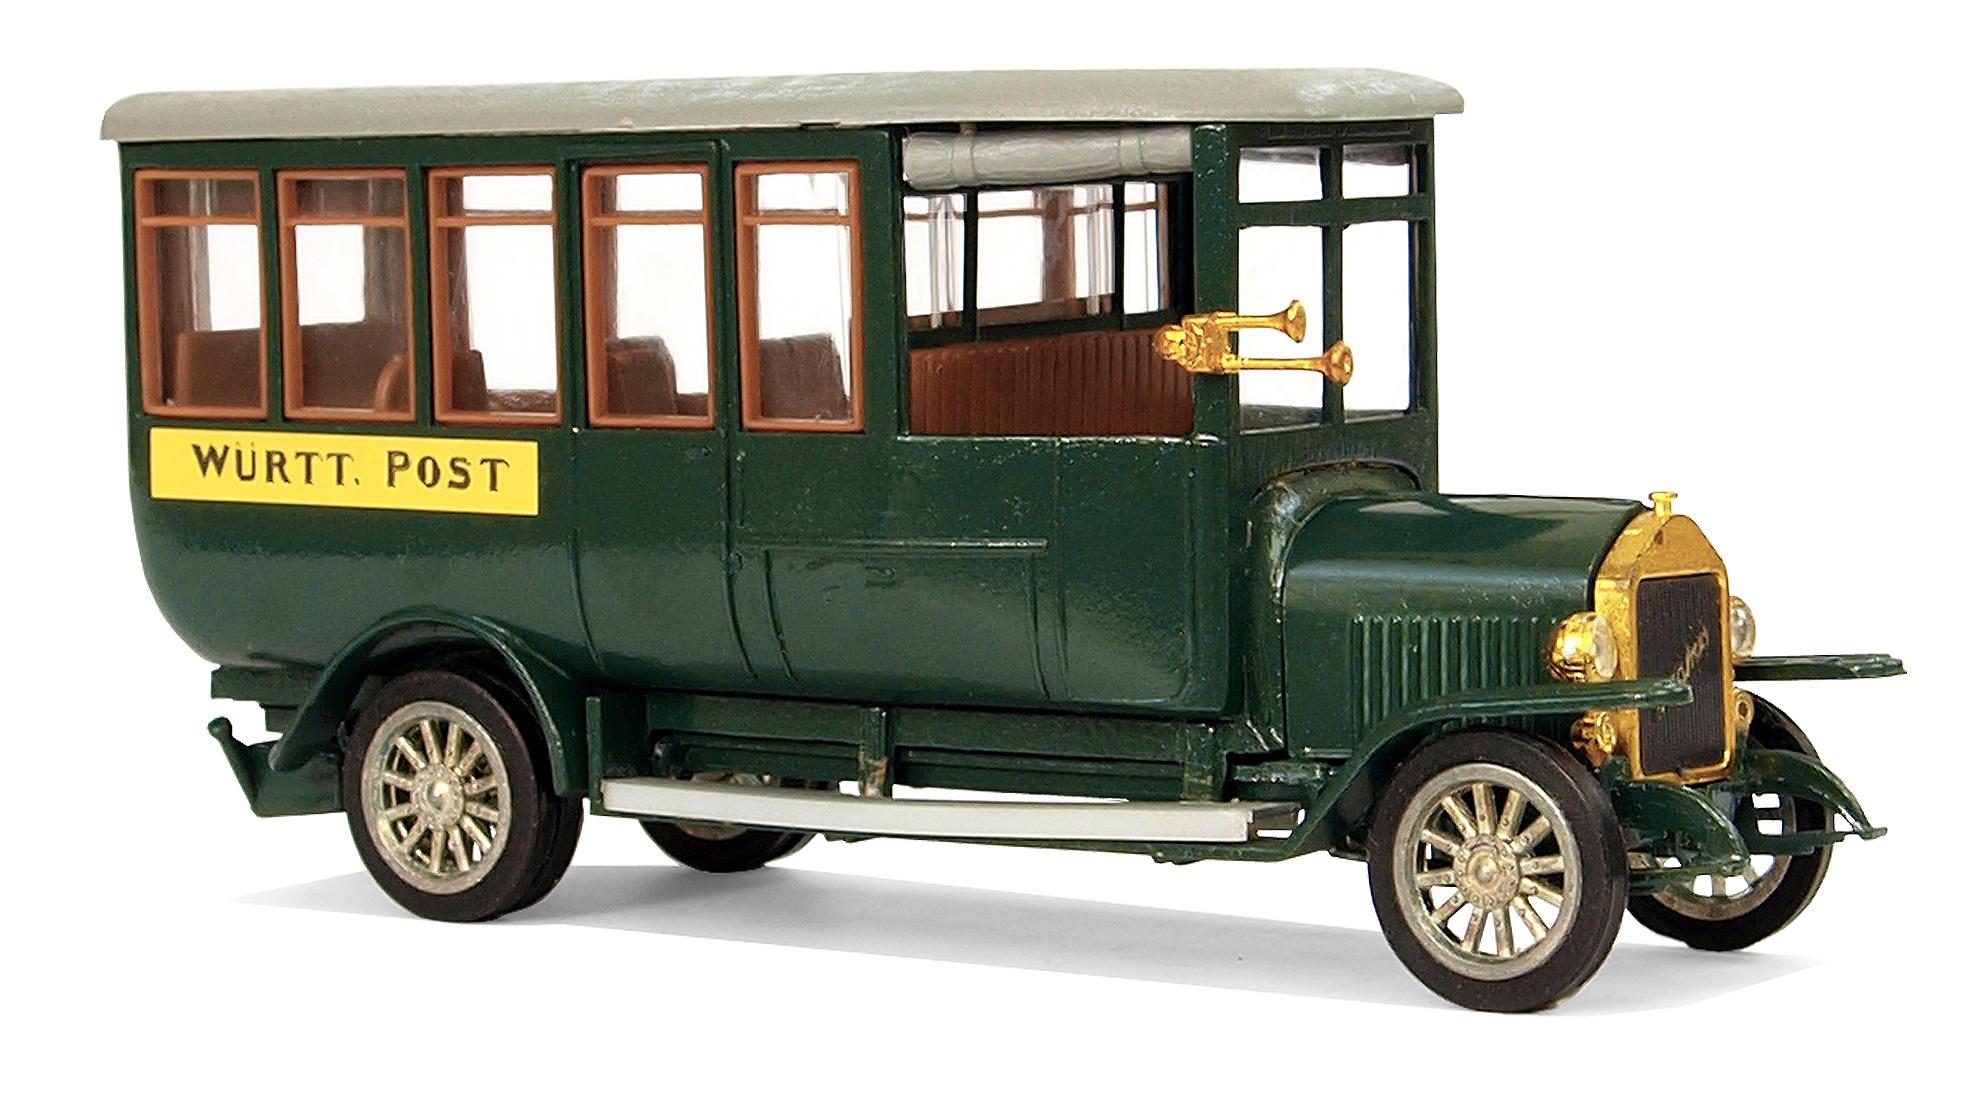 Free Images : truck, leisure, vintage car, oldtimer, classic, model ...